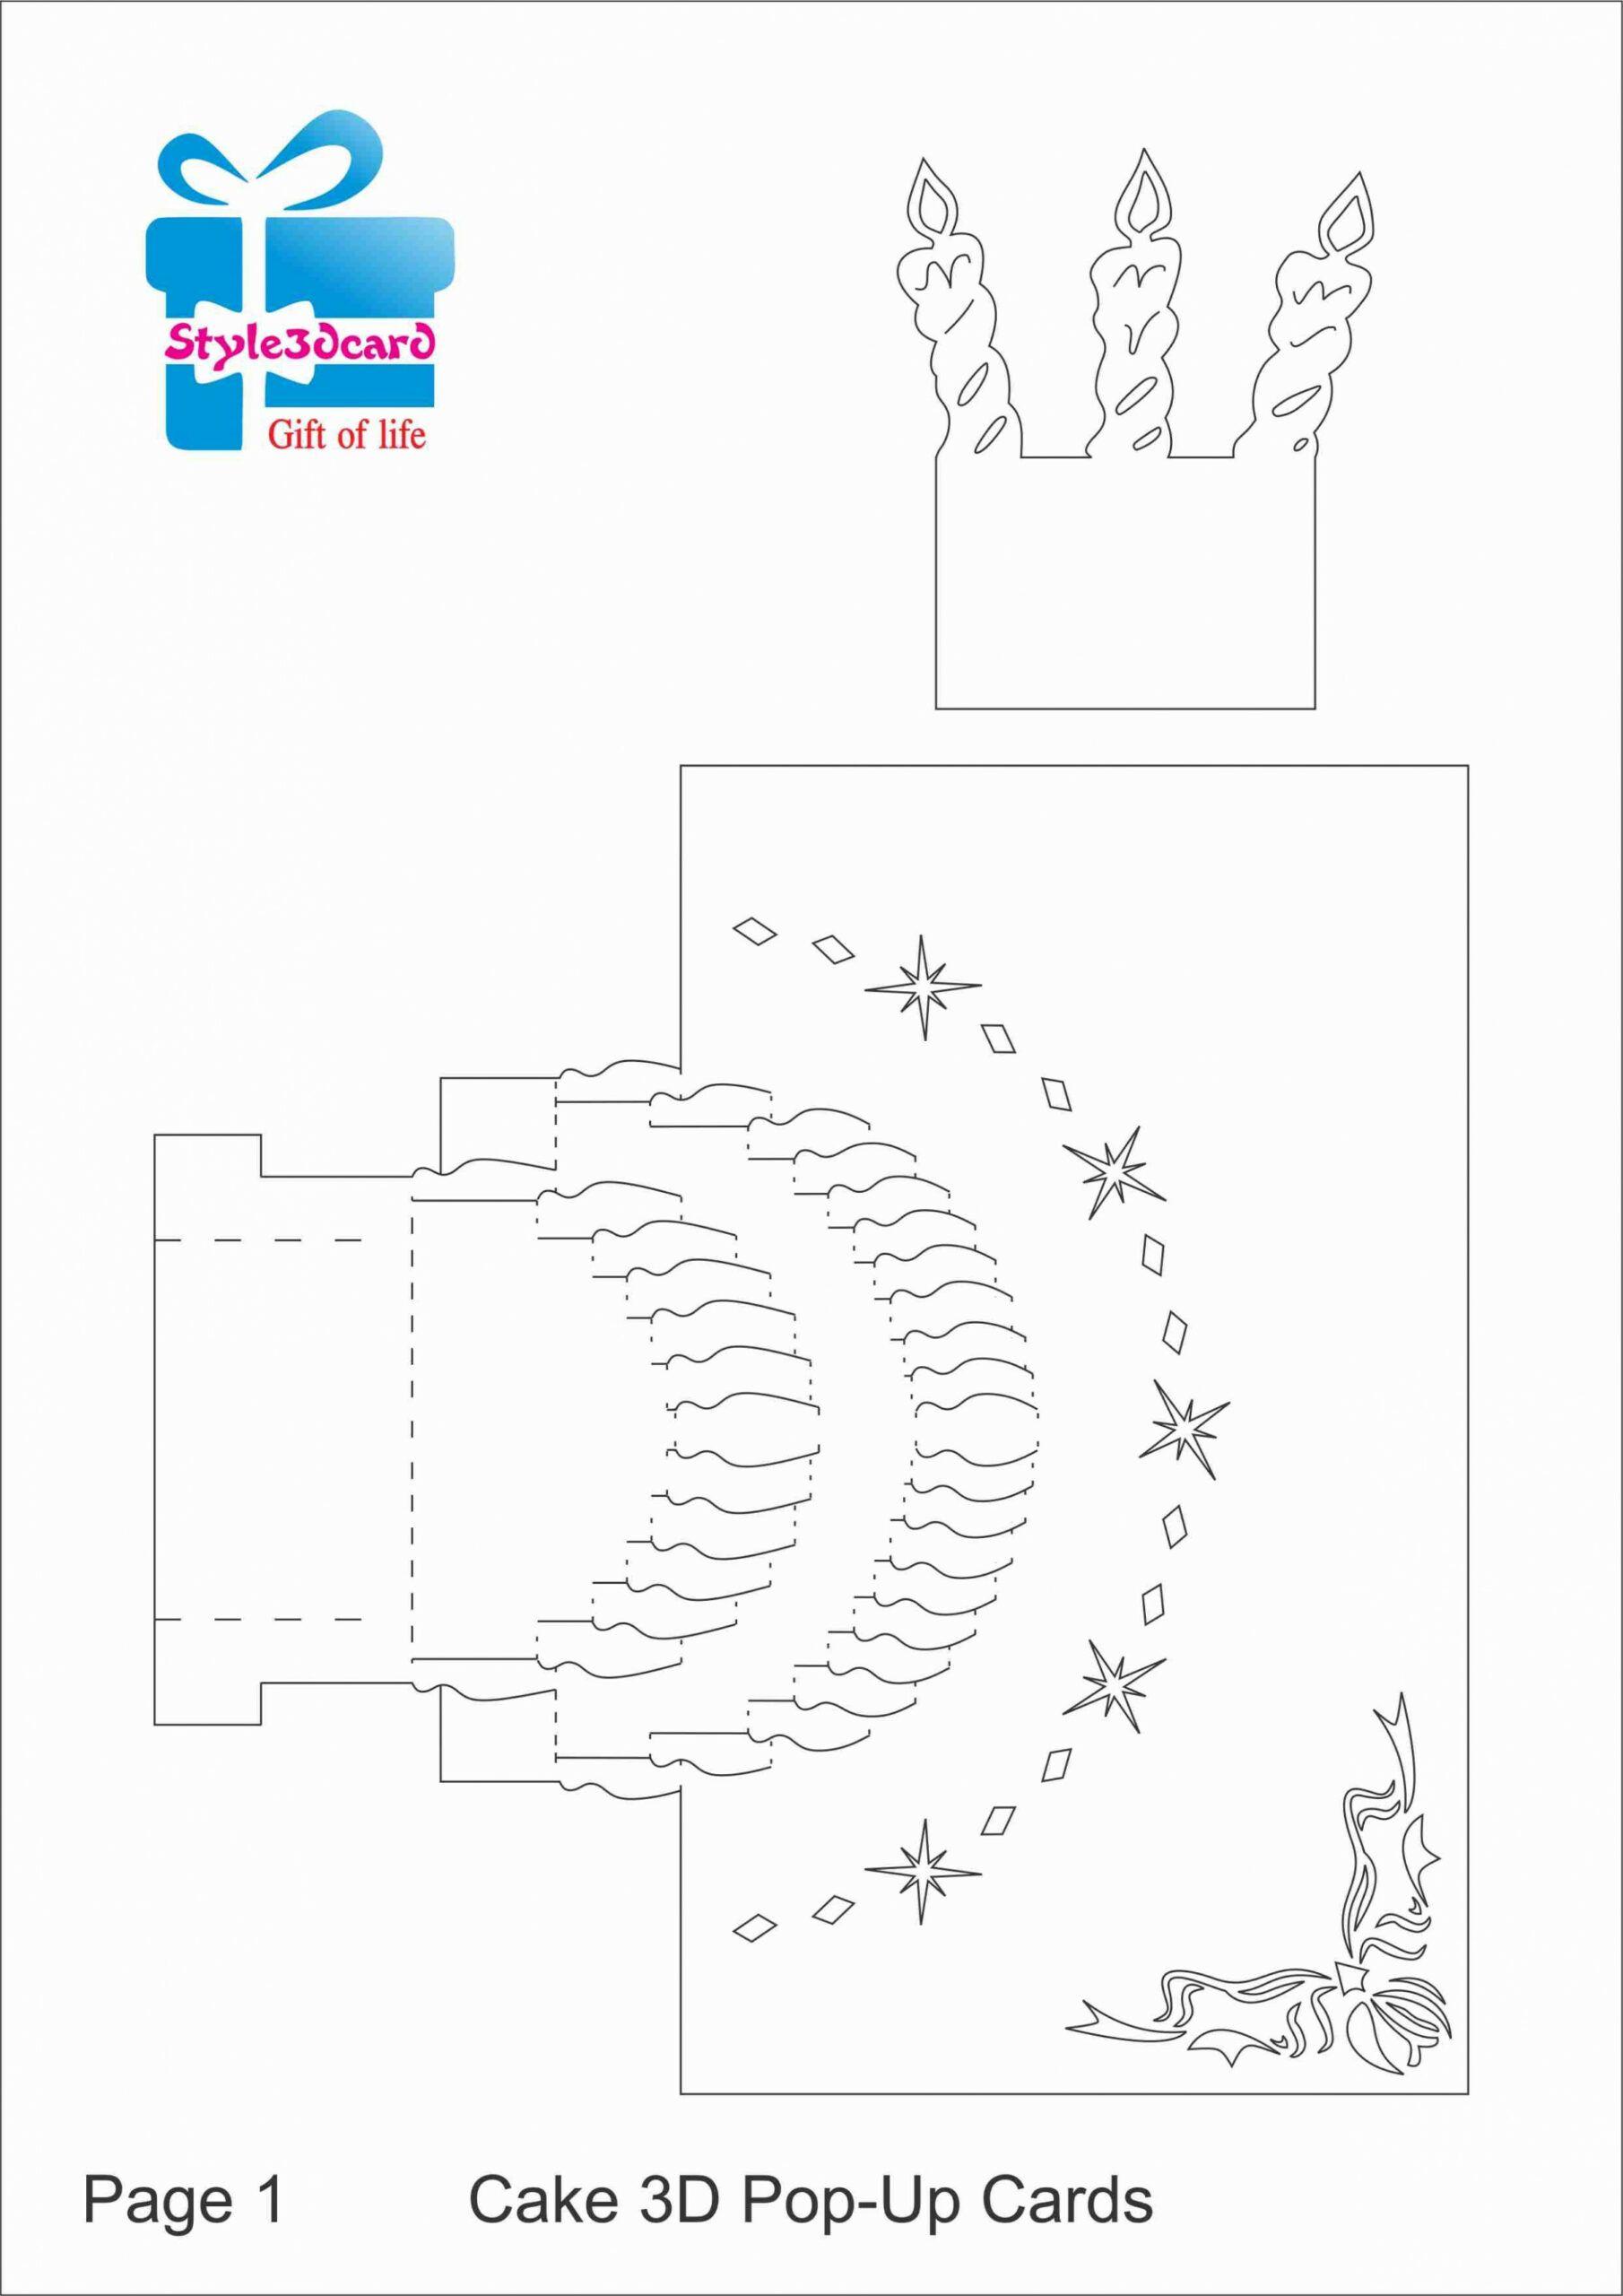 11 Design Pop Up Happy Birthday Card Template August 28